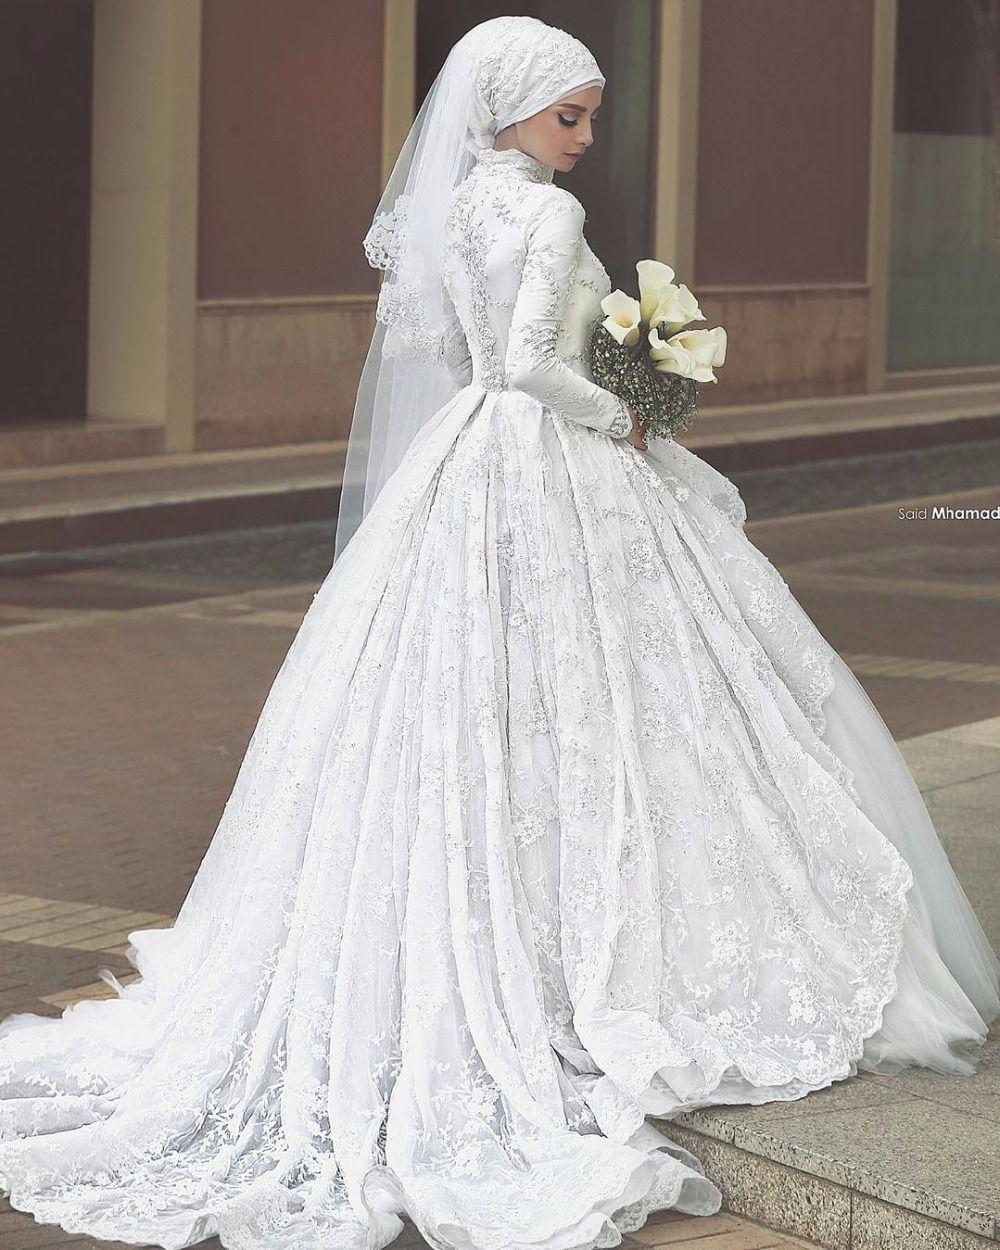 Said Mhamad Princess Hijab Arabic Muslim Lace Long Sleeve Wedding Dresses 2016 Luxury Beads Bridal Robe De Mariée Arabe Robe De Mariee Robe De Mariée Musulmane